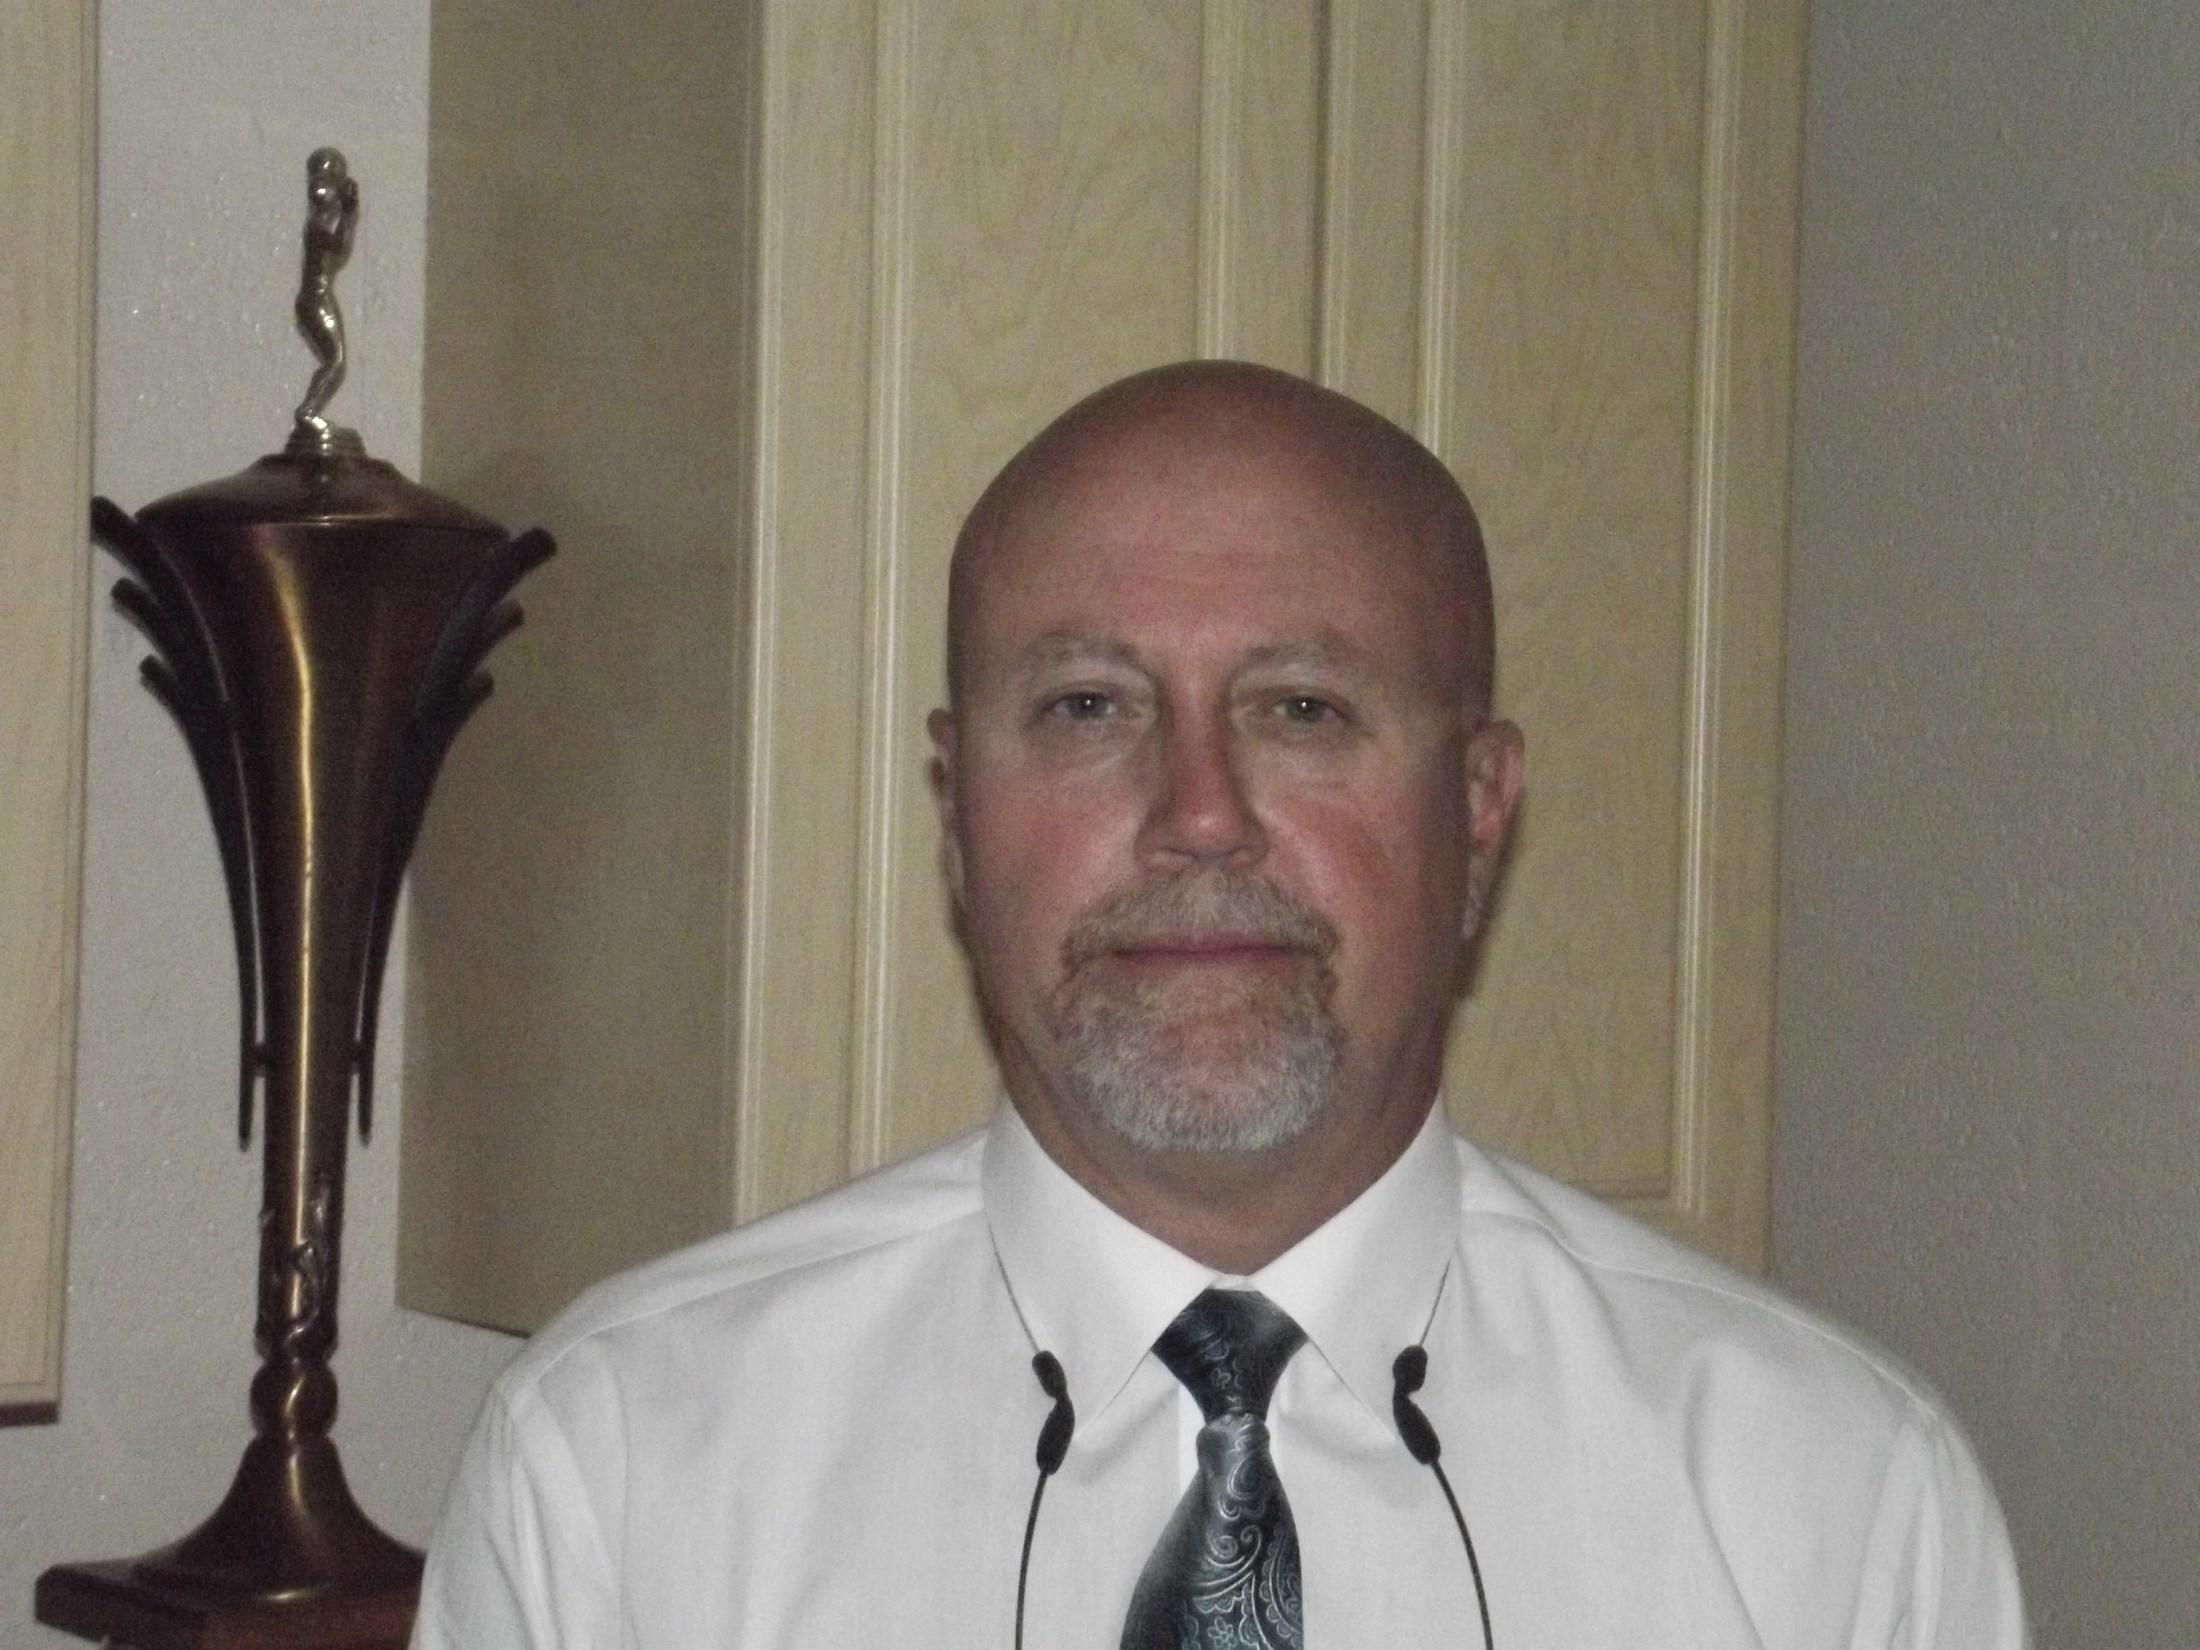 Principal Fisher